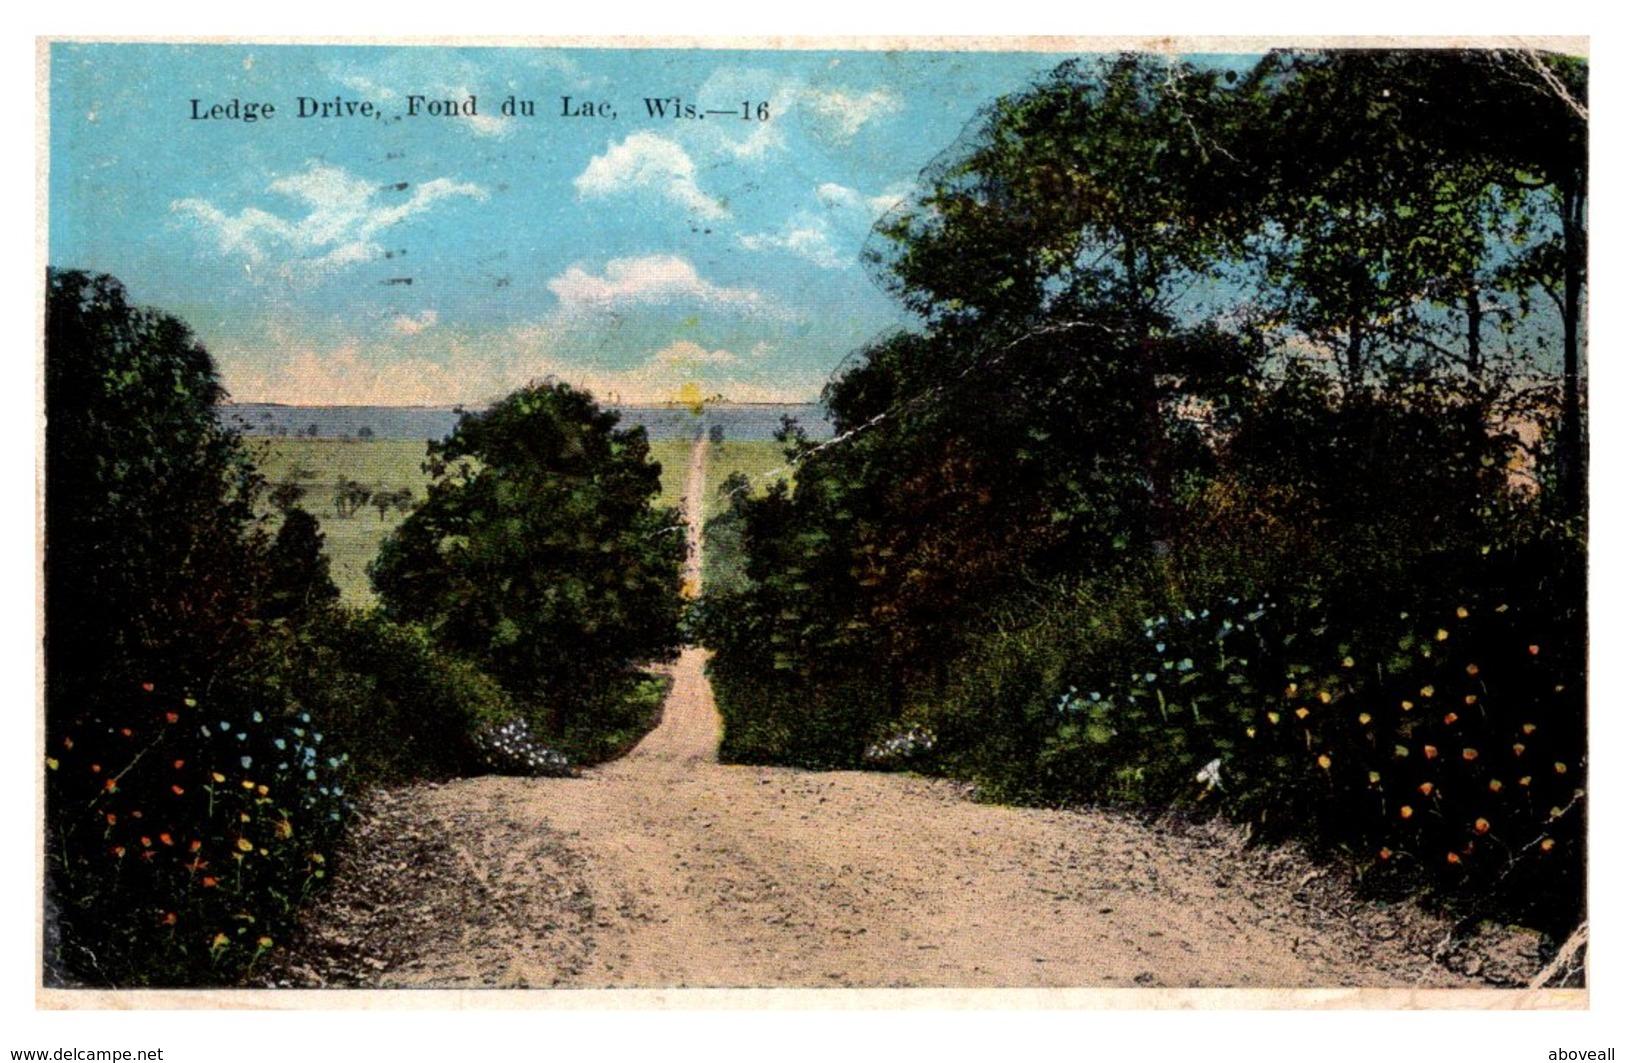 Wisconsin Fond du Lac , Ledge Drive